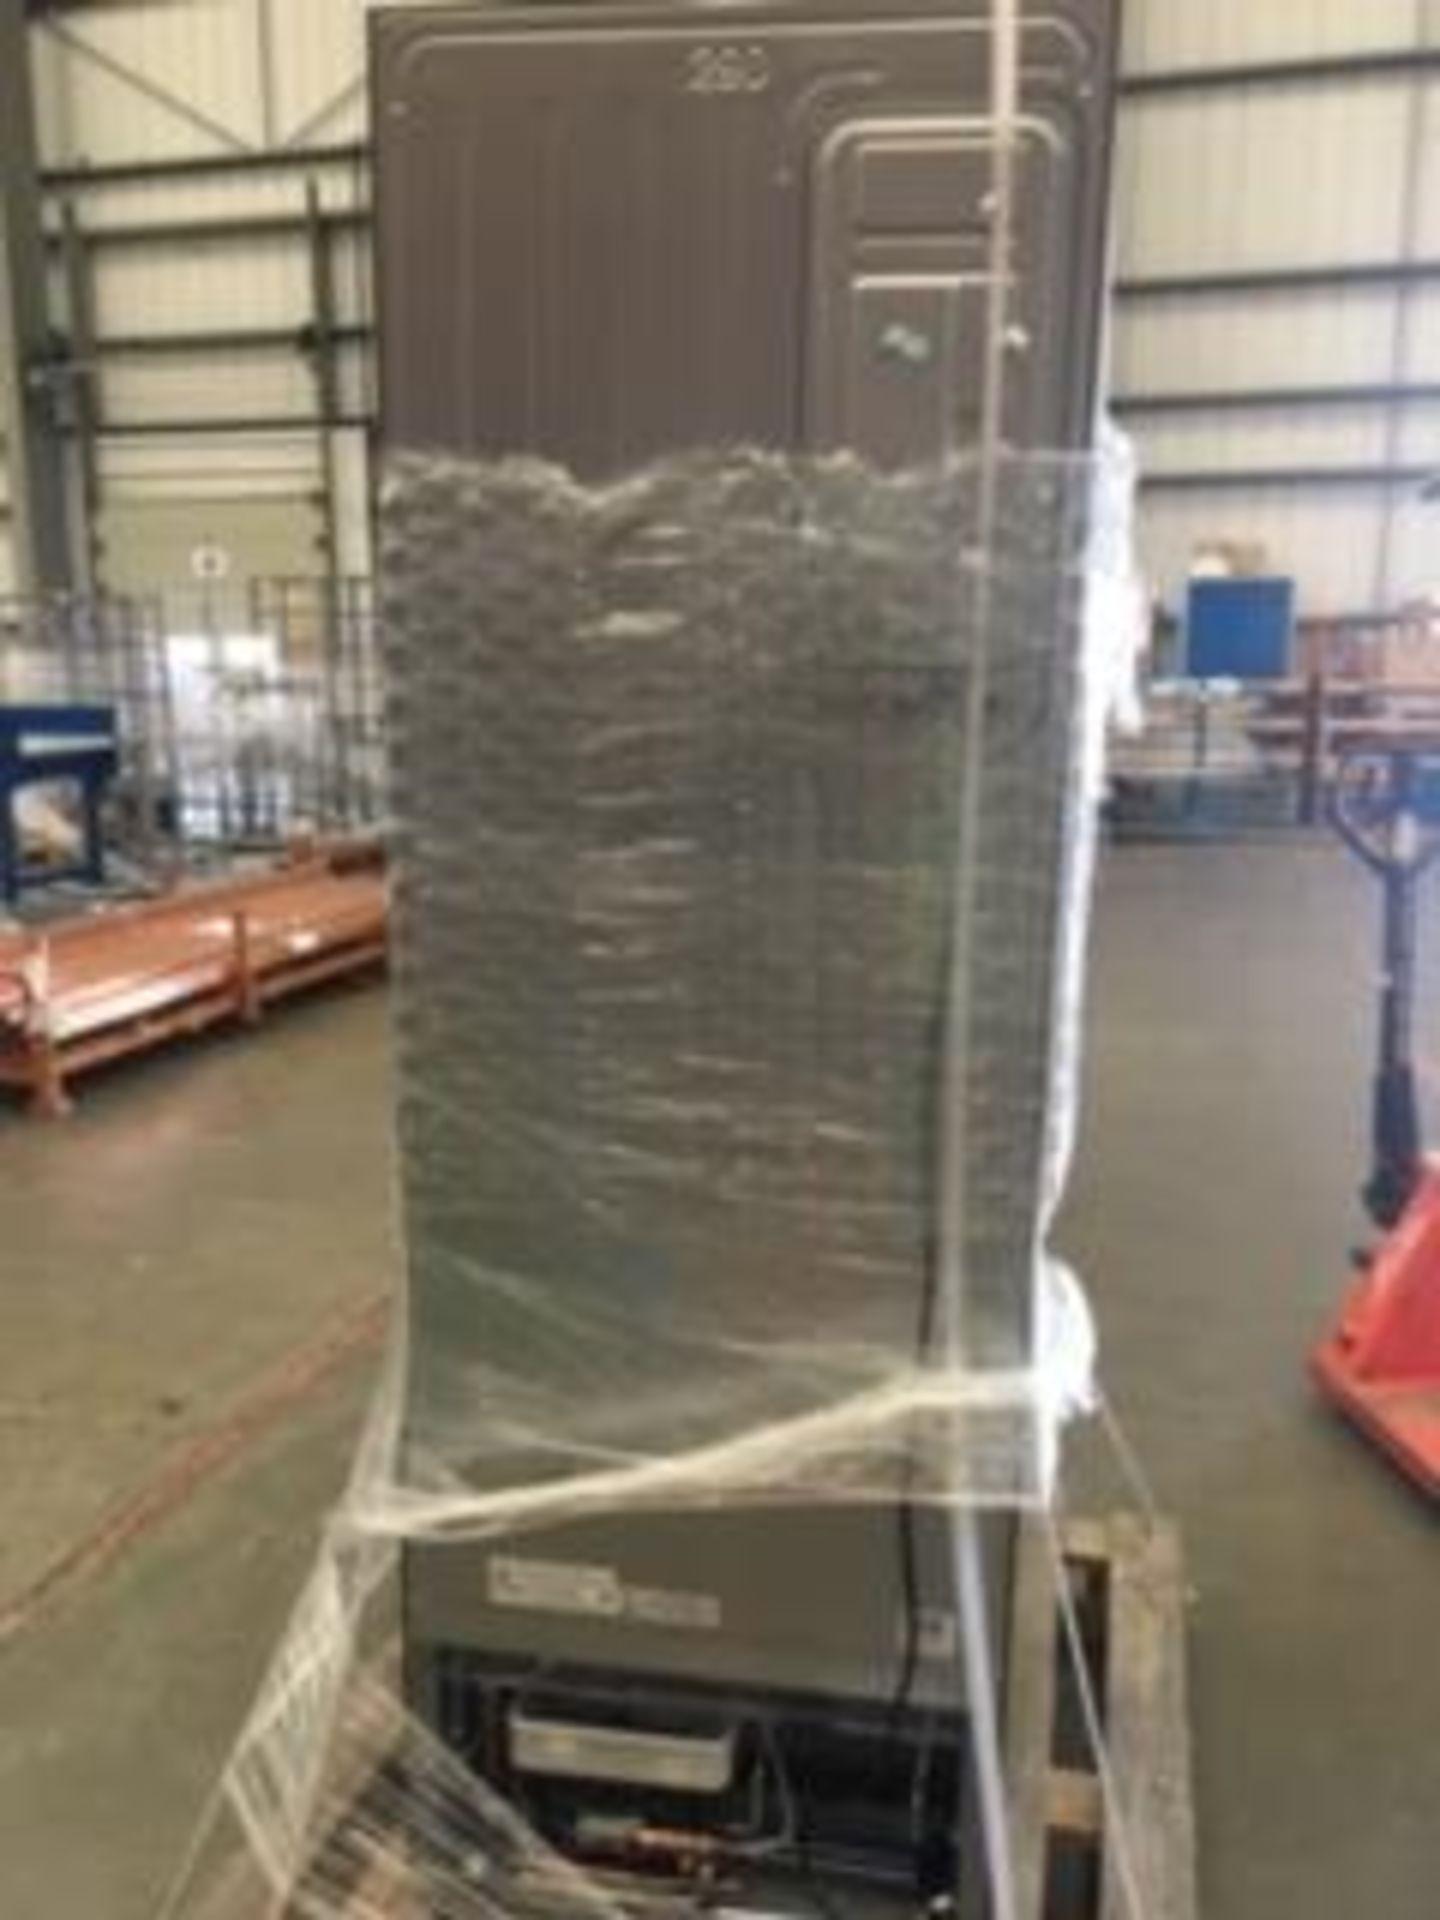 Pallet of 1 Samsung 60CM Fridge Freezer. Latest selling price £399 - Image 5 of 7